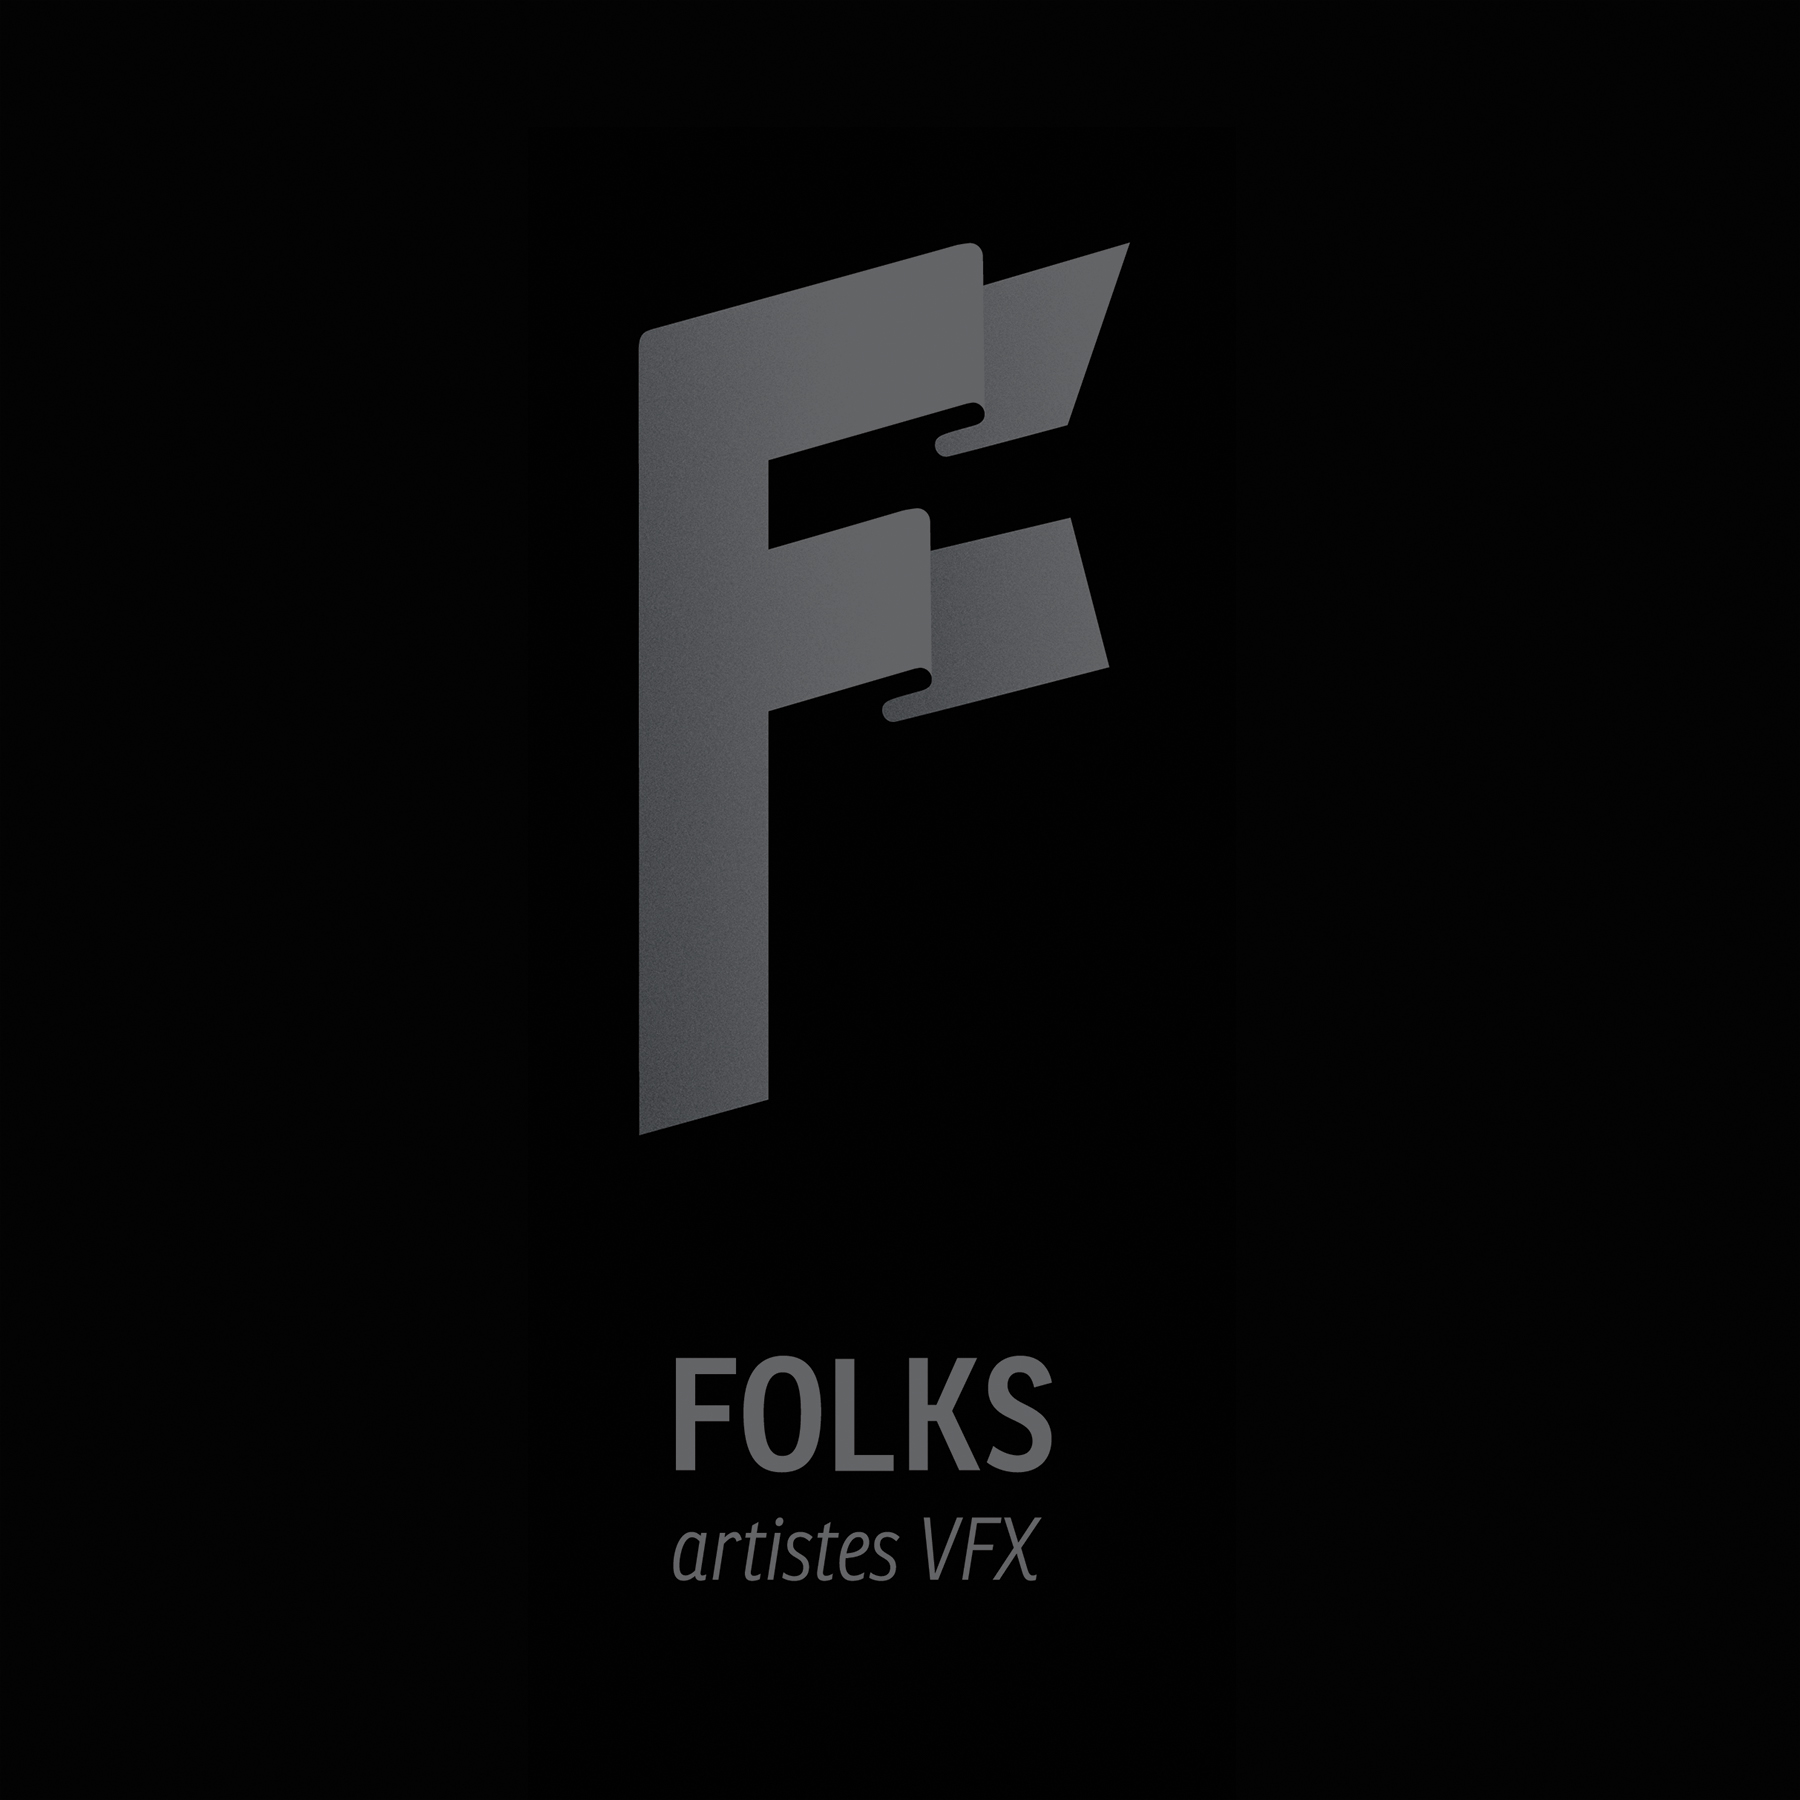 Folks VFX